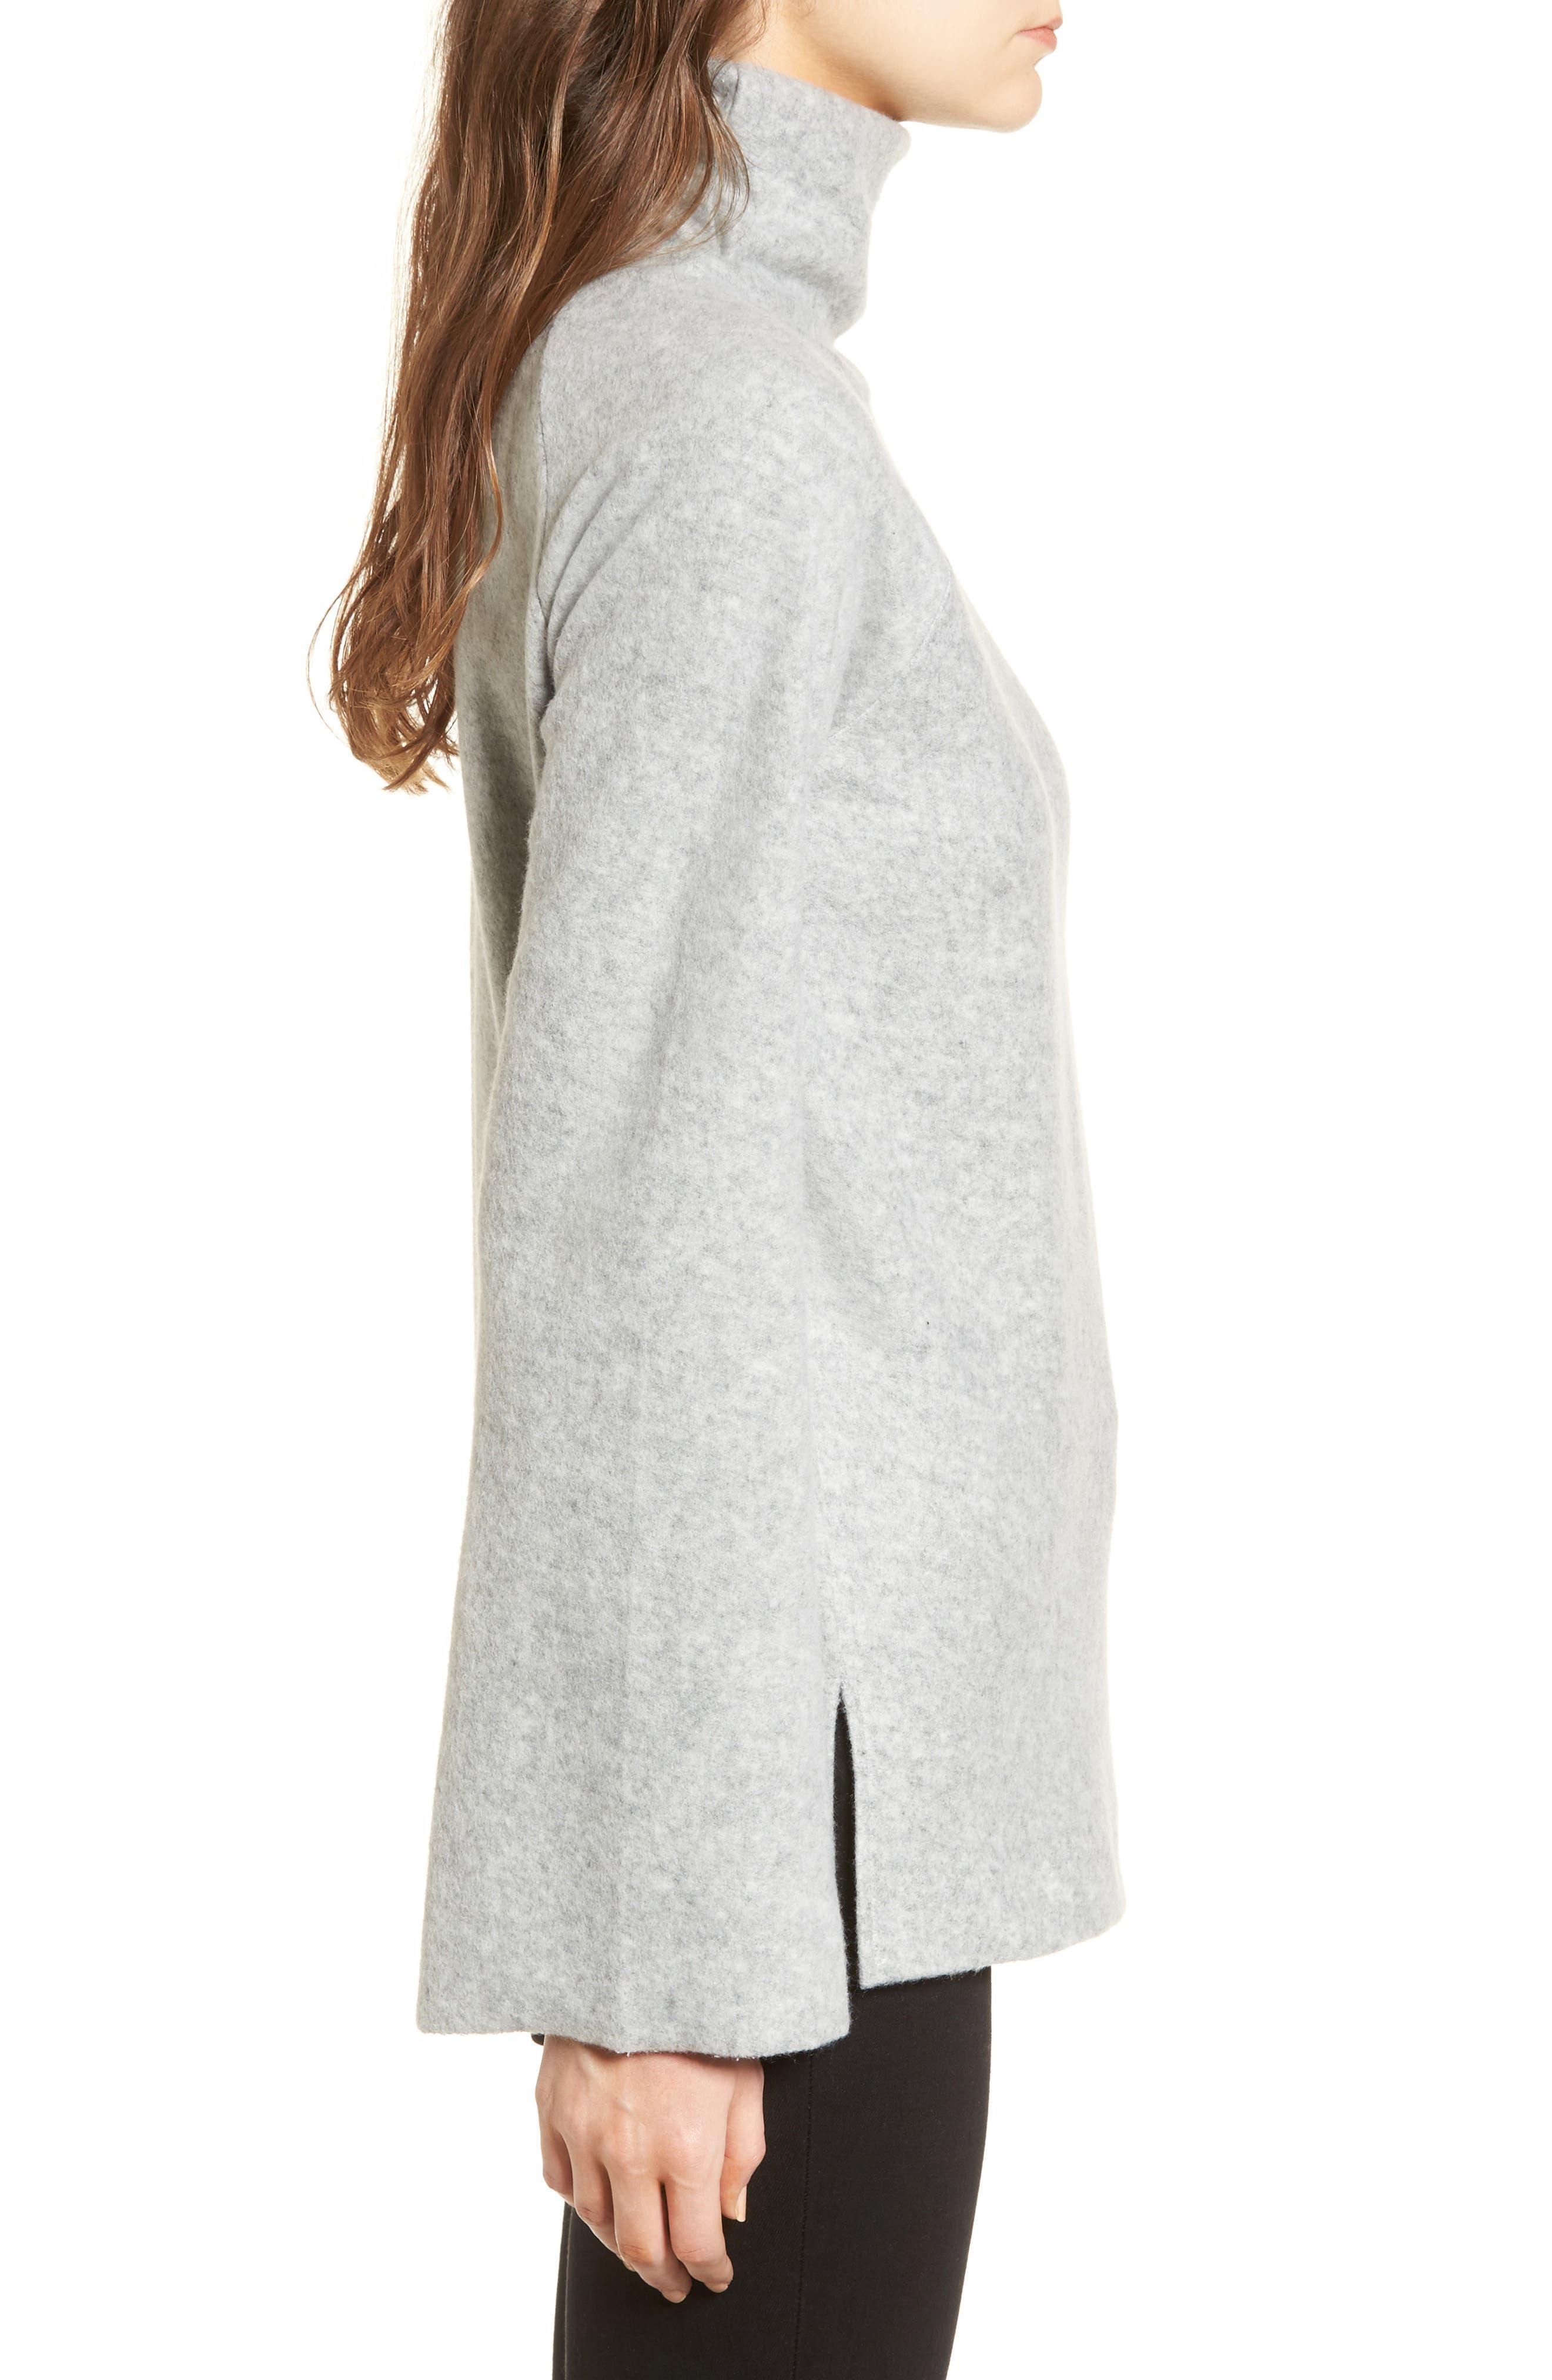 Bell Sleeve Sweatshirt,                             Alternate thumbnail 3, color,                             Grey Heather